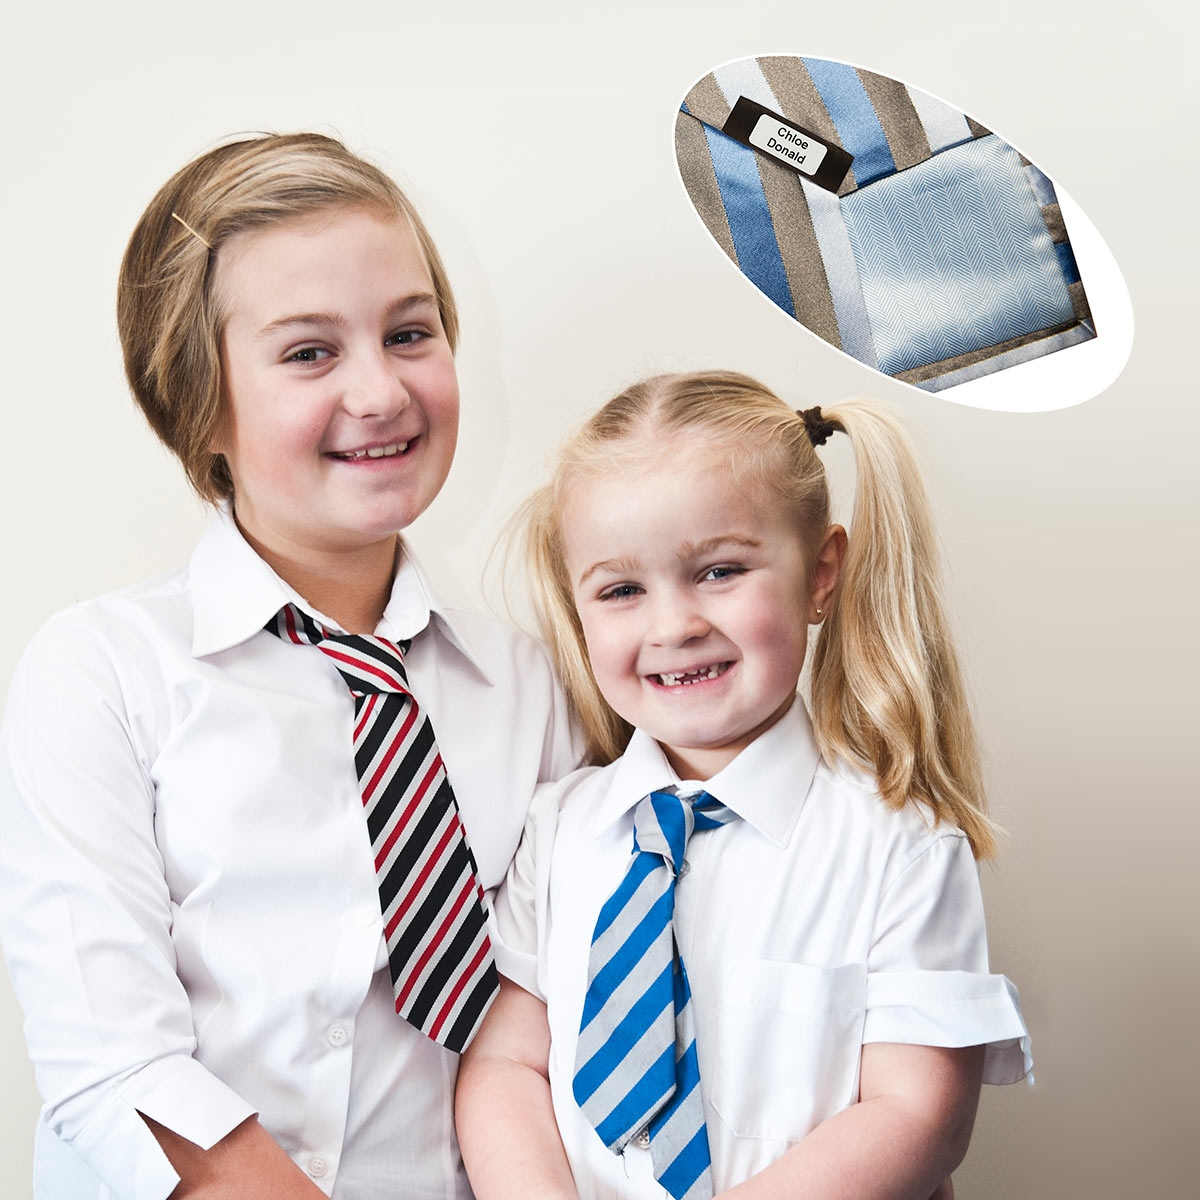 School uniform labels